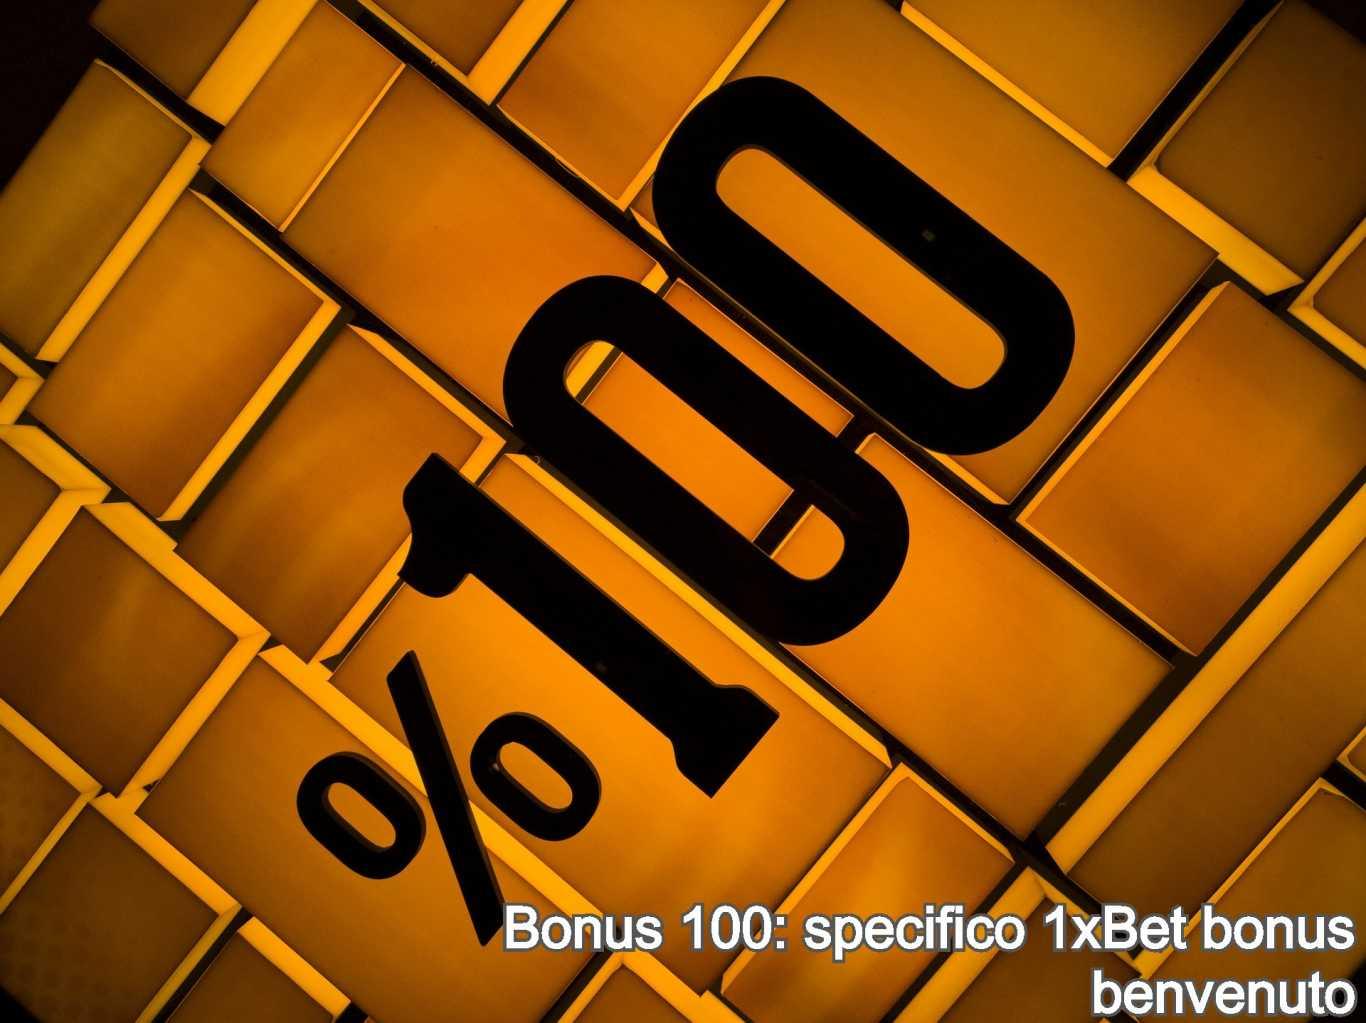 Bonus 100: specifico 1xBet bonus benvenuto